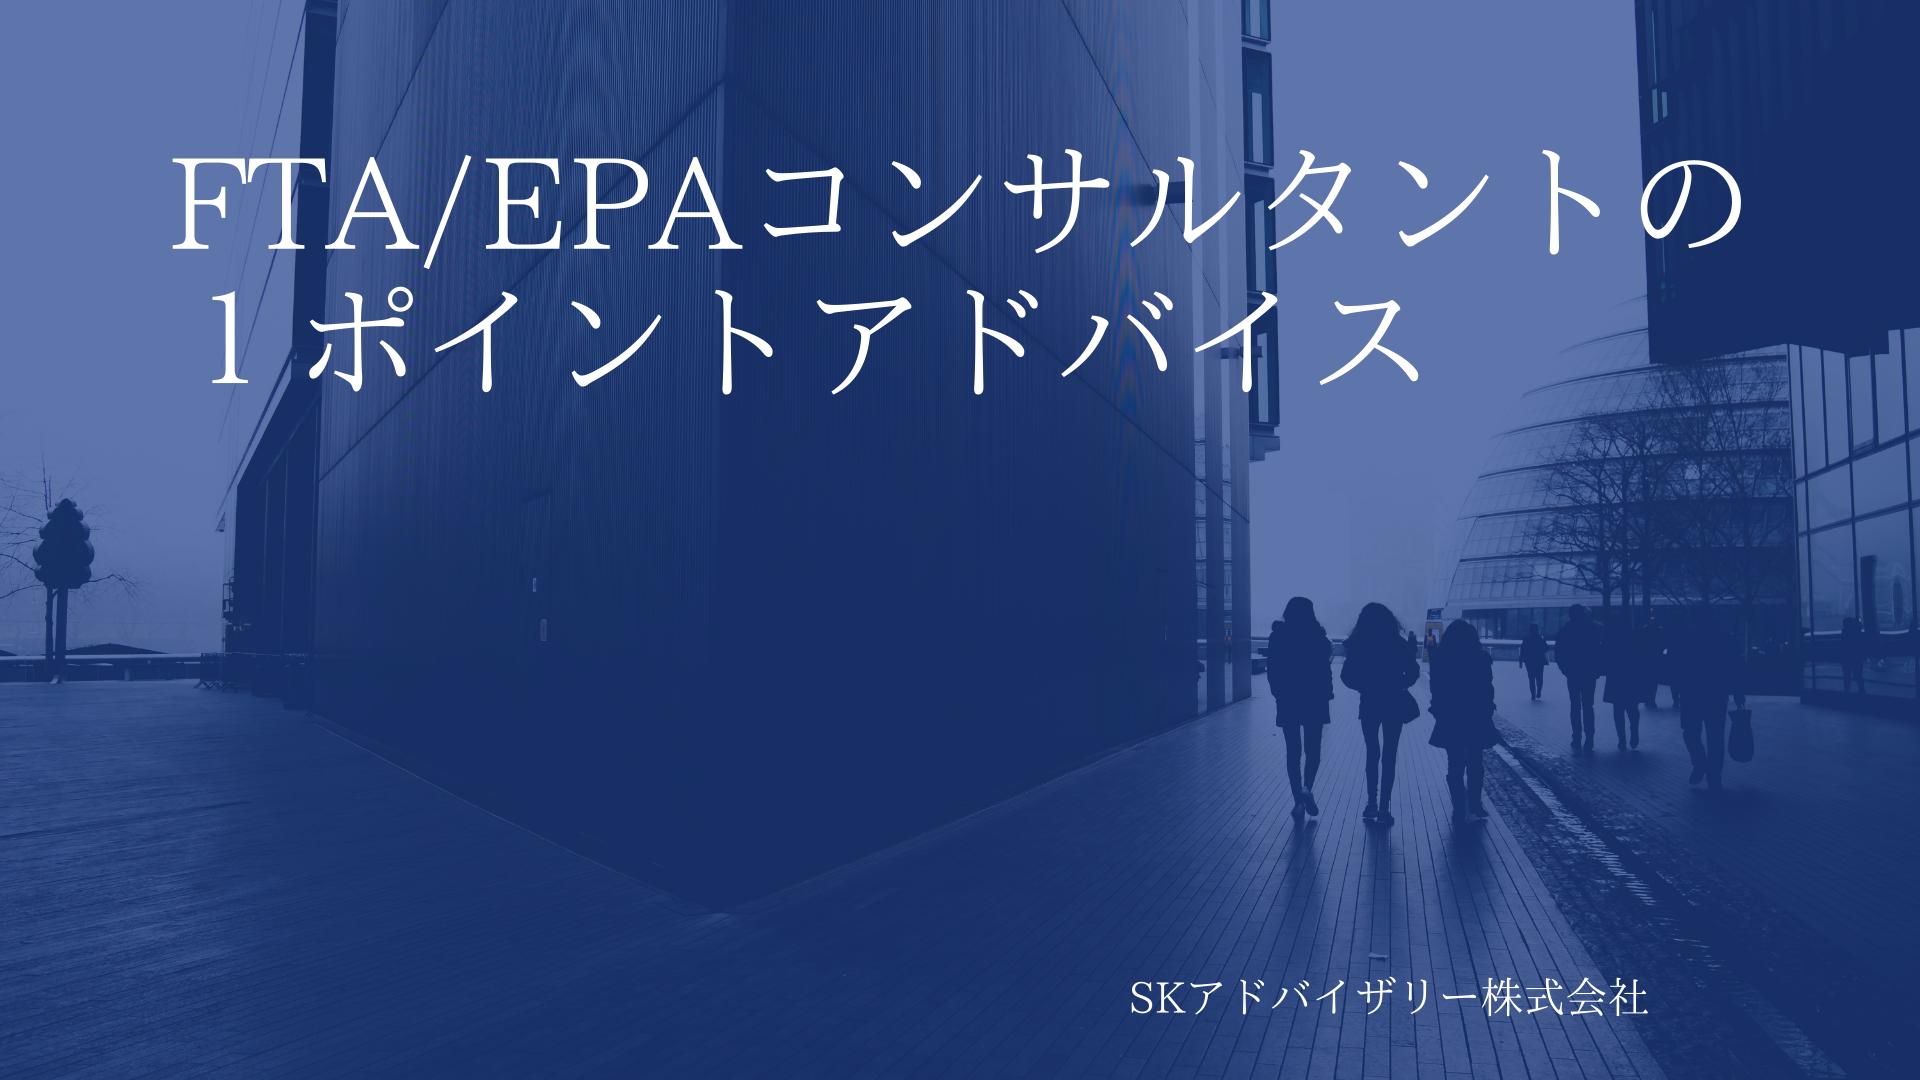 FTA/EPA 1ポイントアドバイス